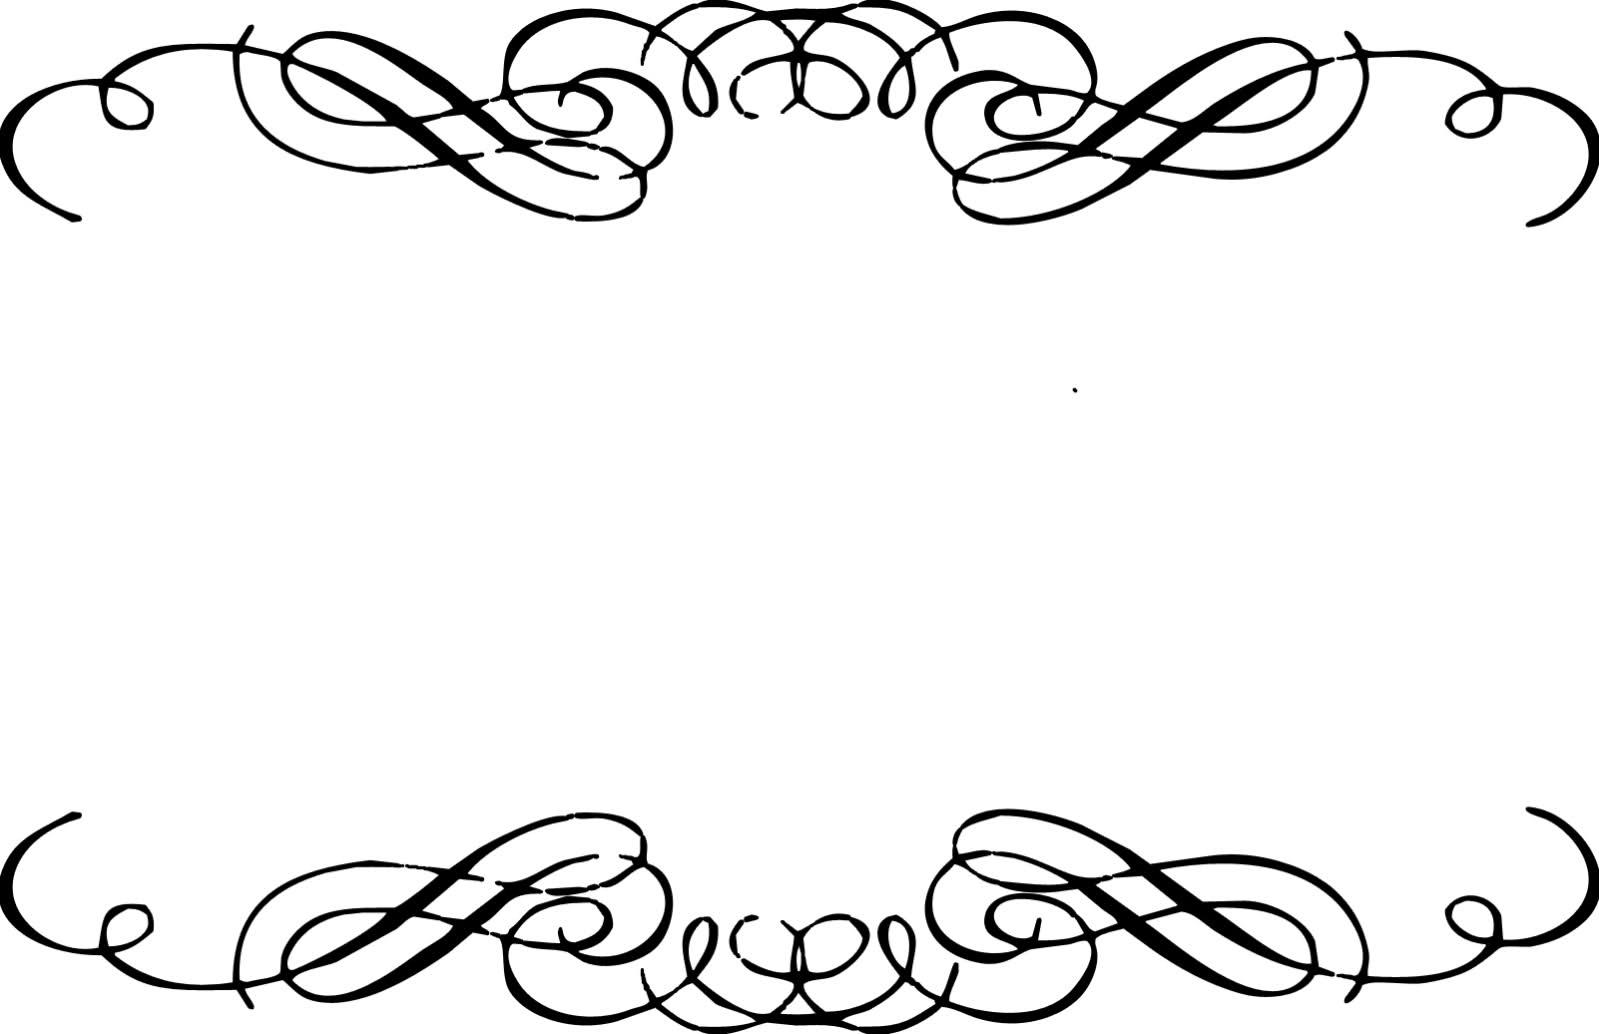 1599x1034 Clip Art Border For Microsoft Word Clipart